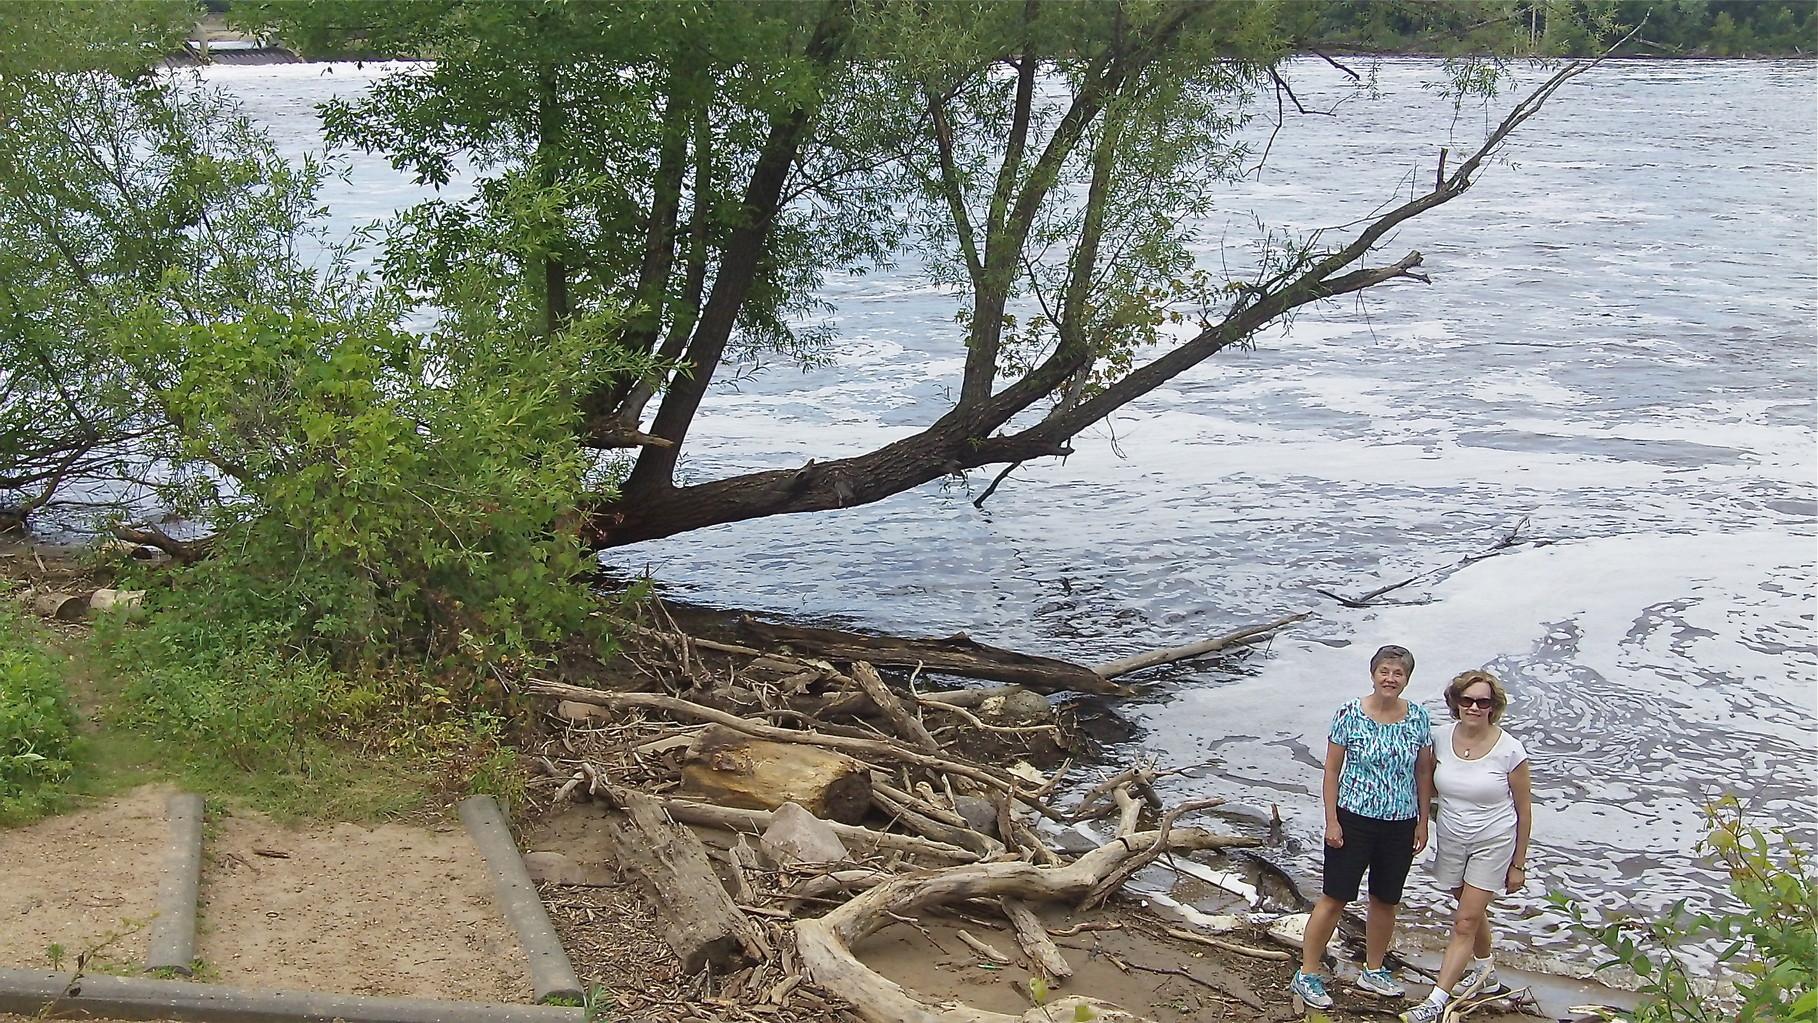 Cindy & Lorraine along the river